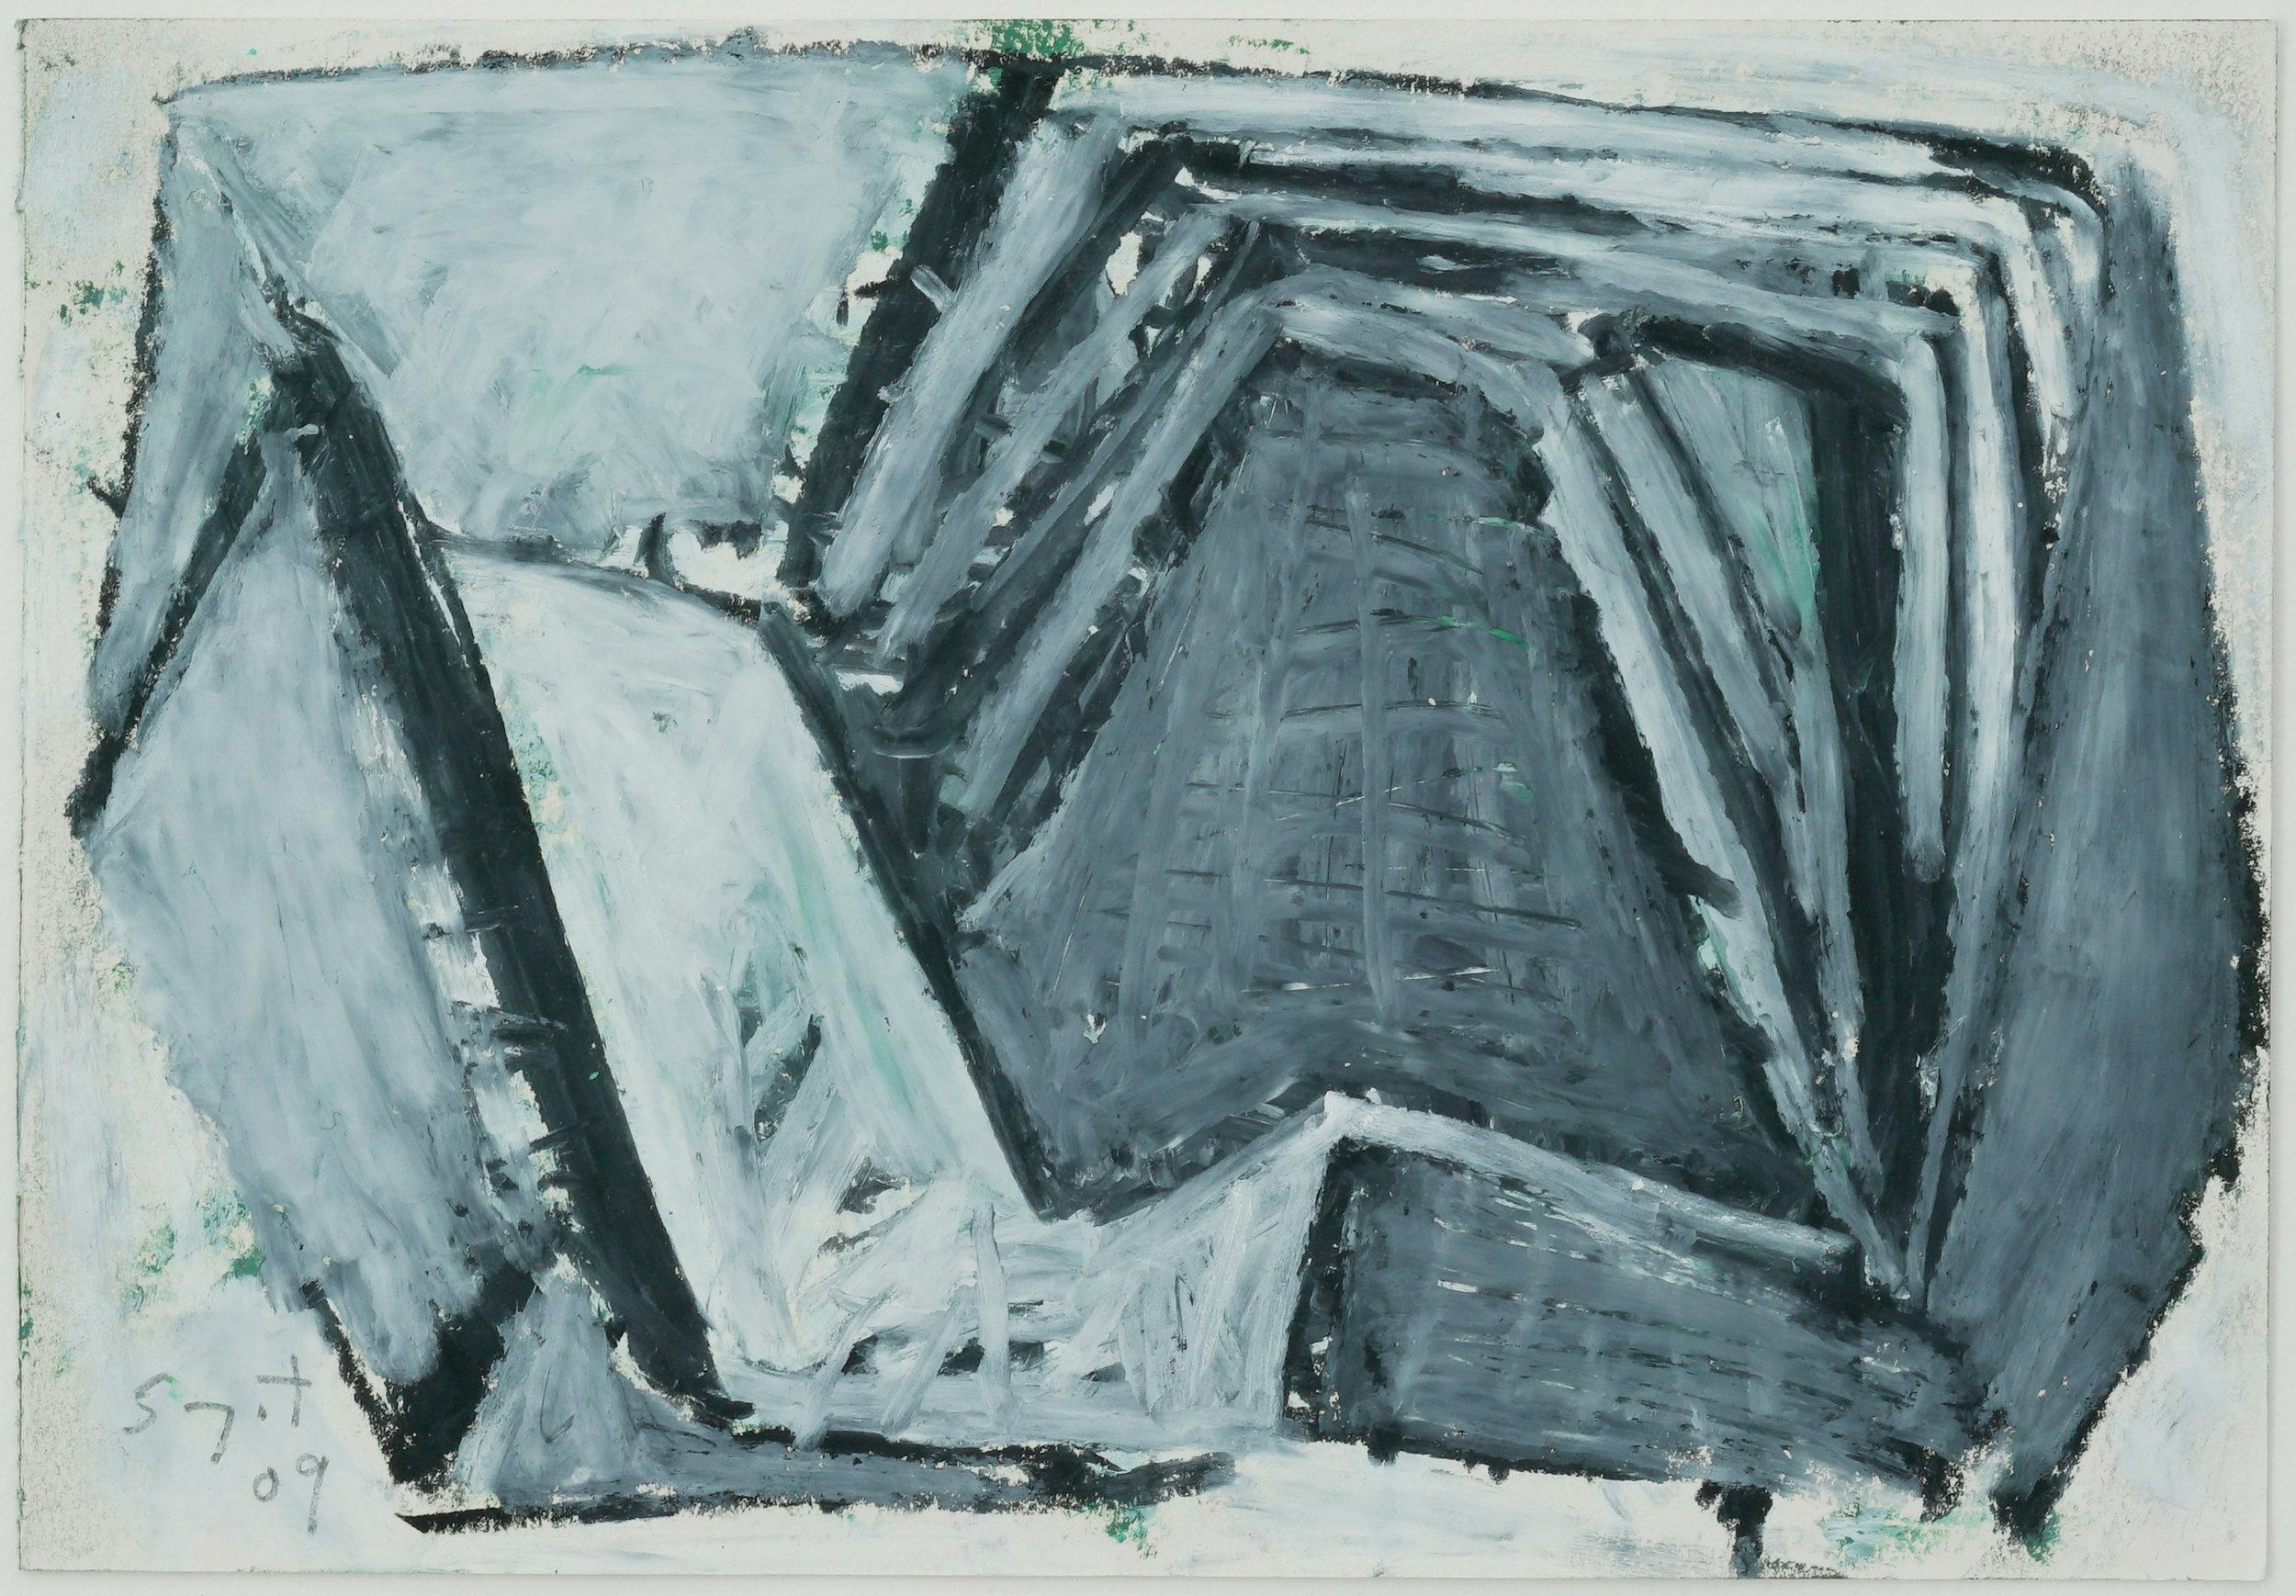 Somyot Hananuntasuk, #26, 2018, Oil Pastel on Paper, 18 x 26 cm, Affinity Ar